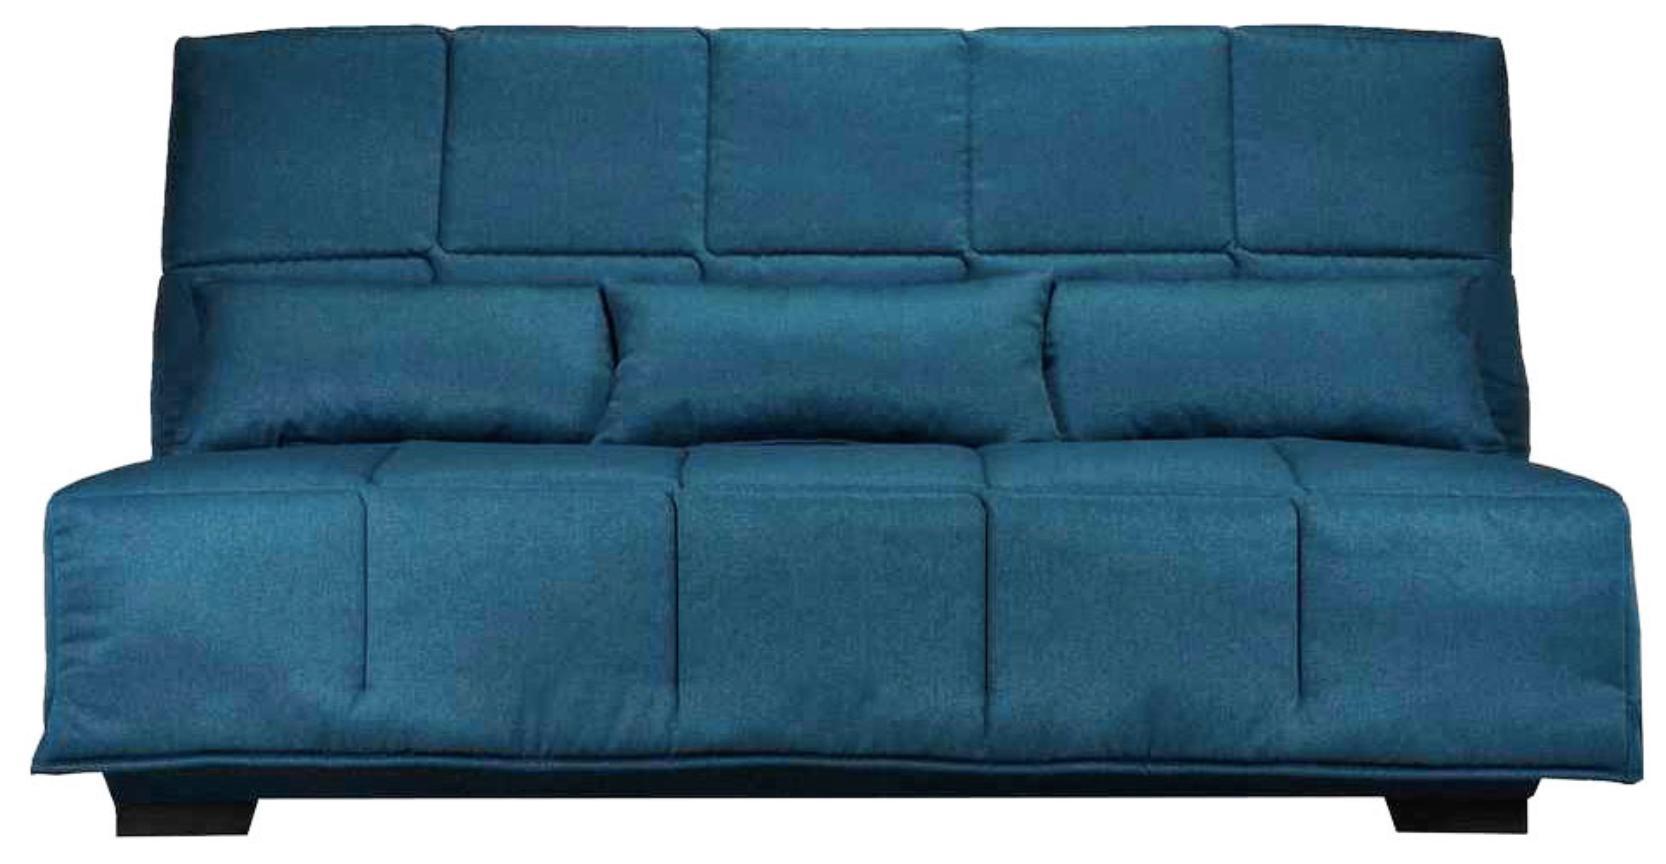 clic clac matelas bultex 15 cm baltan couleur b912. Black Bedroom Furniture Sets. Home Design Ideas